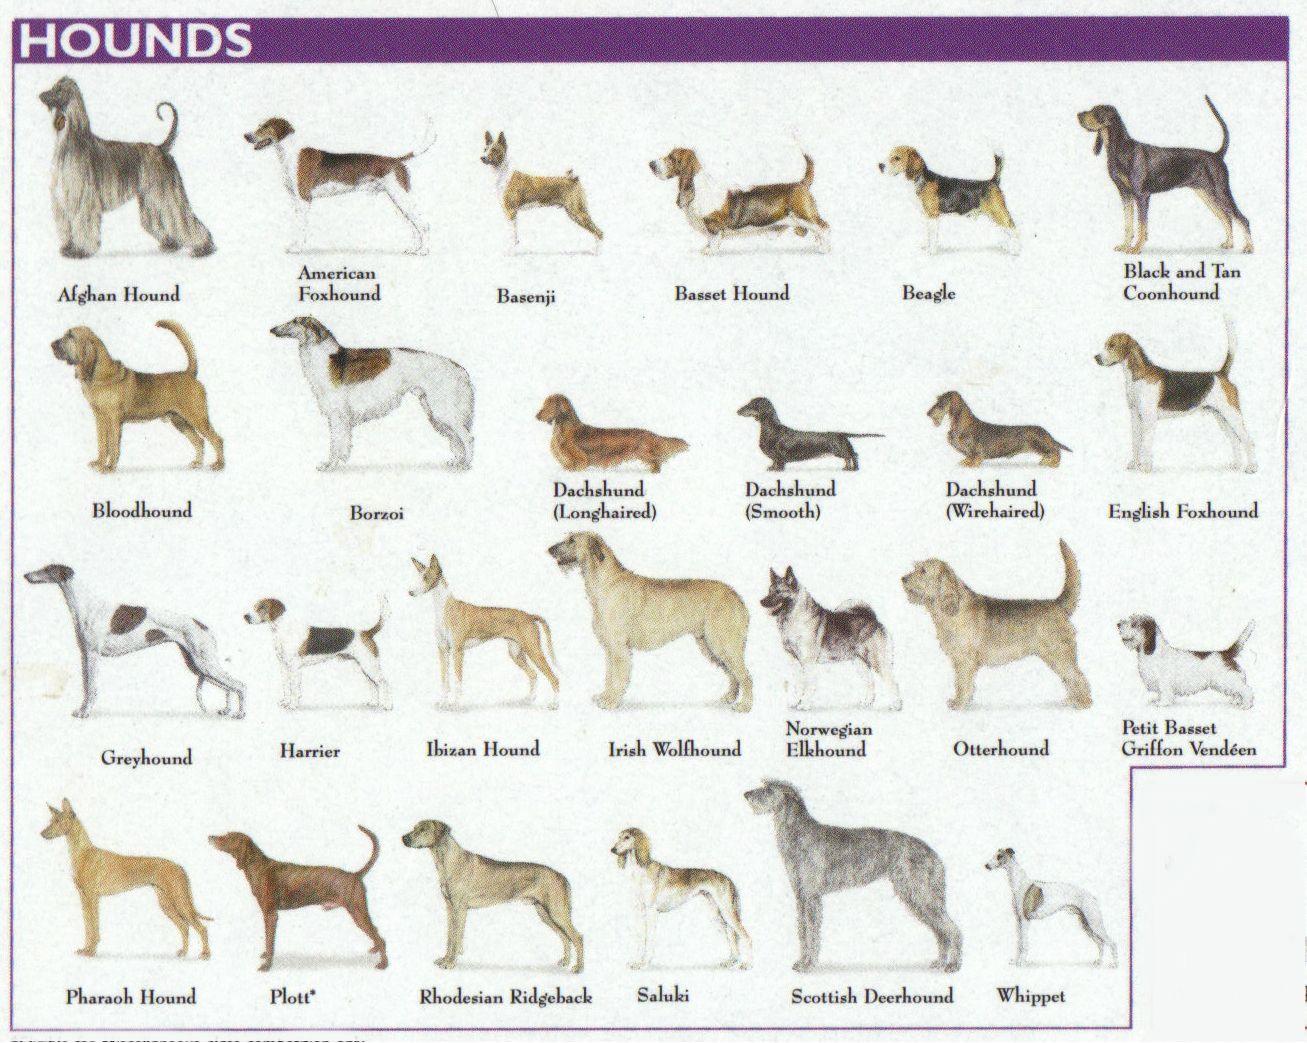 The 7 Dog Breed Groups Explained Dogs Hound Dog Breeds | Hound dog breeds,  Dog breeds, Hound breeds